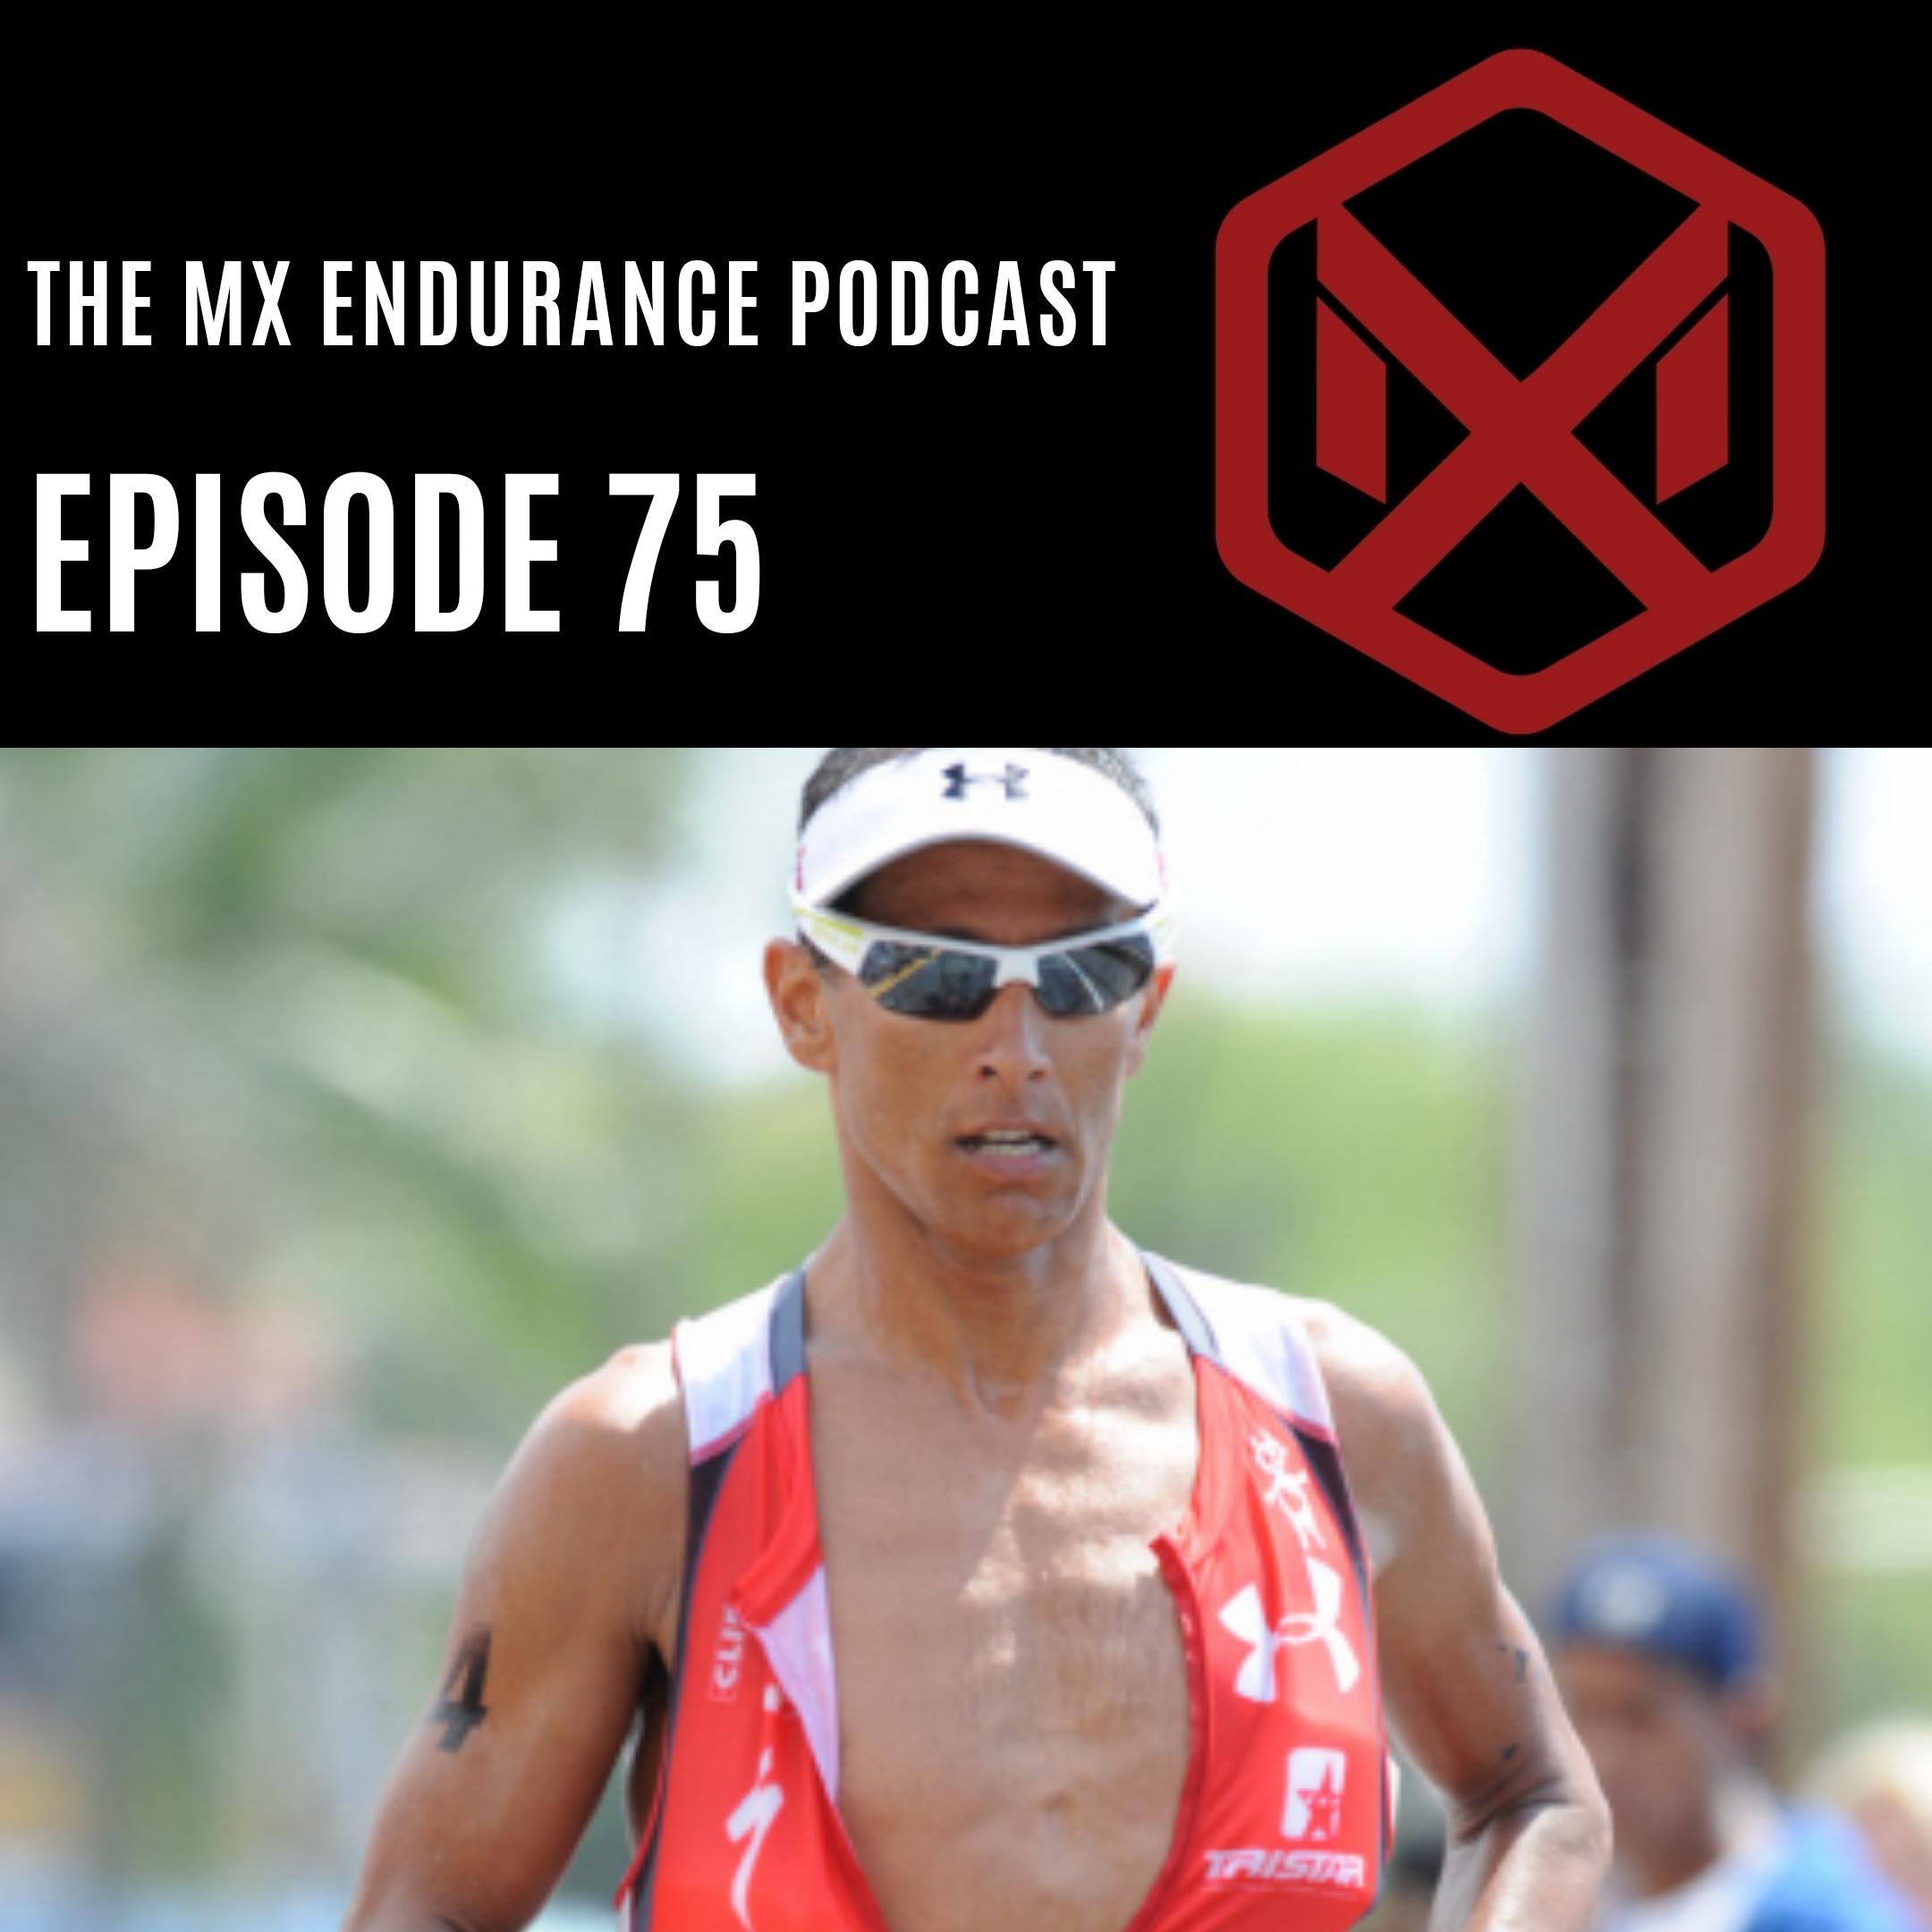 #75 - Macca's Guide To Running